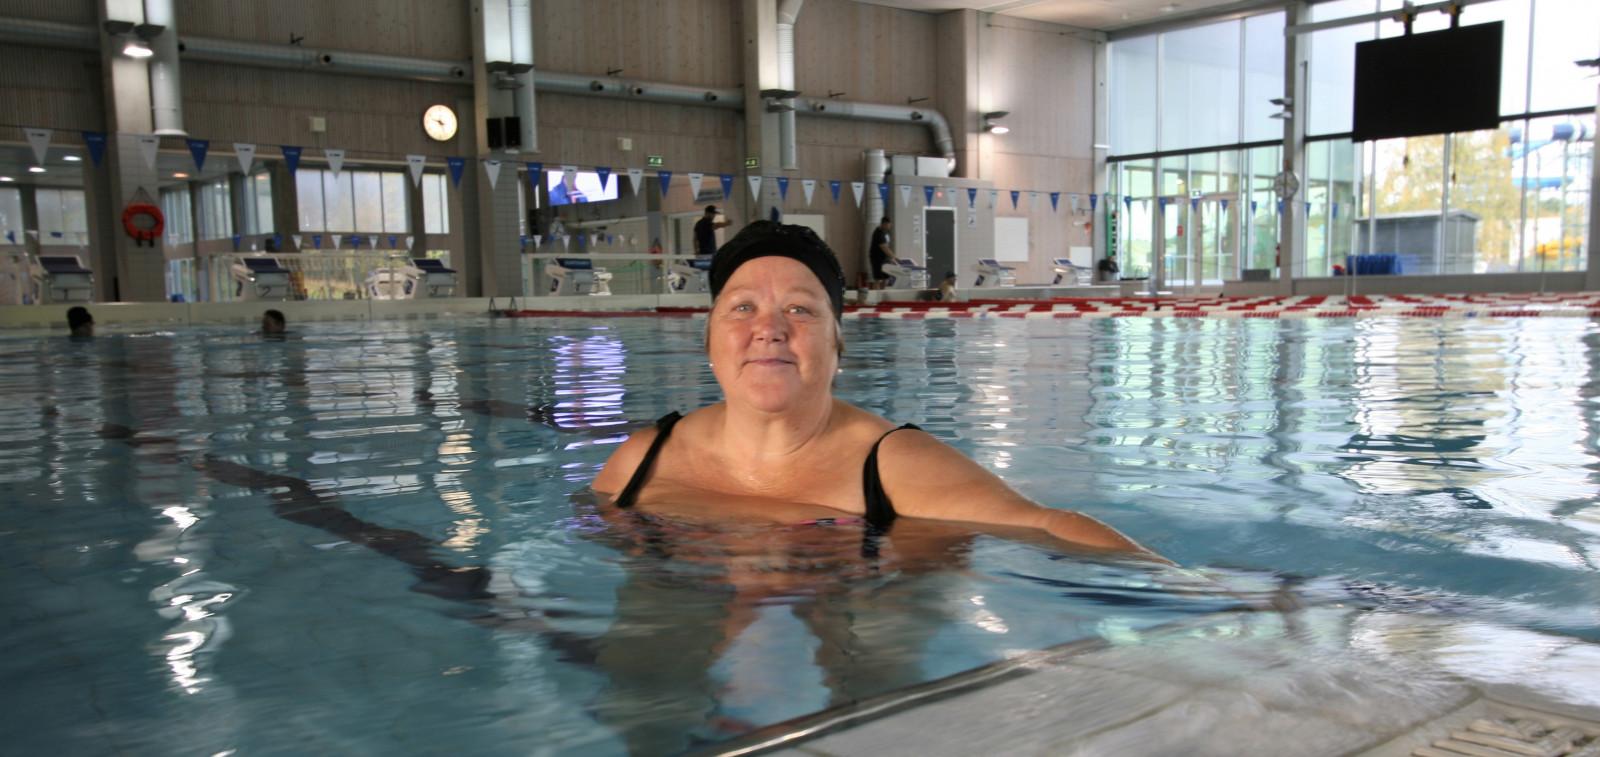 Leena Marjut Alanko Impivaaran uimahallin Juhani-altaassa.